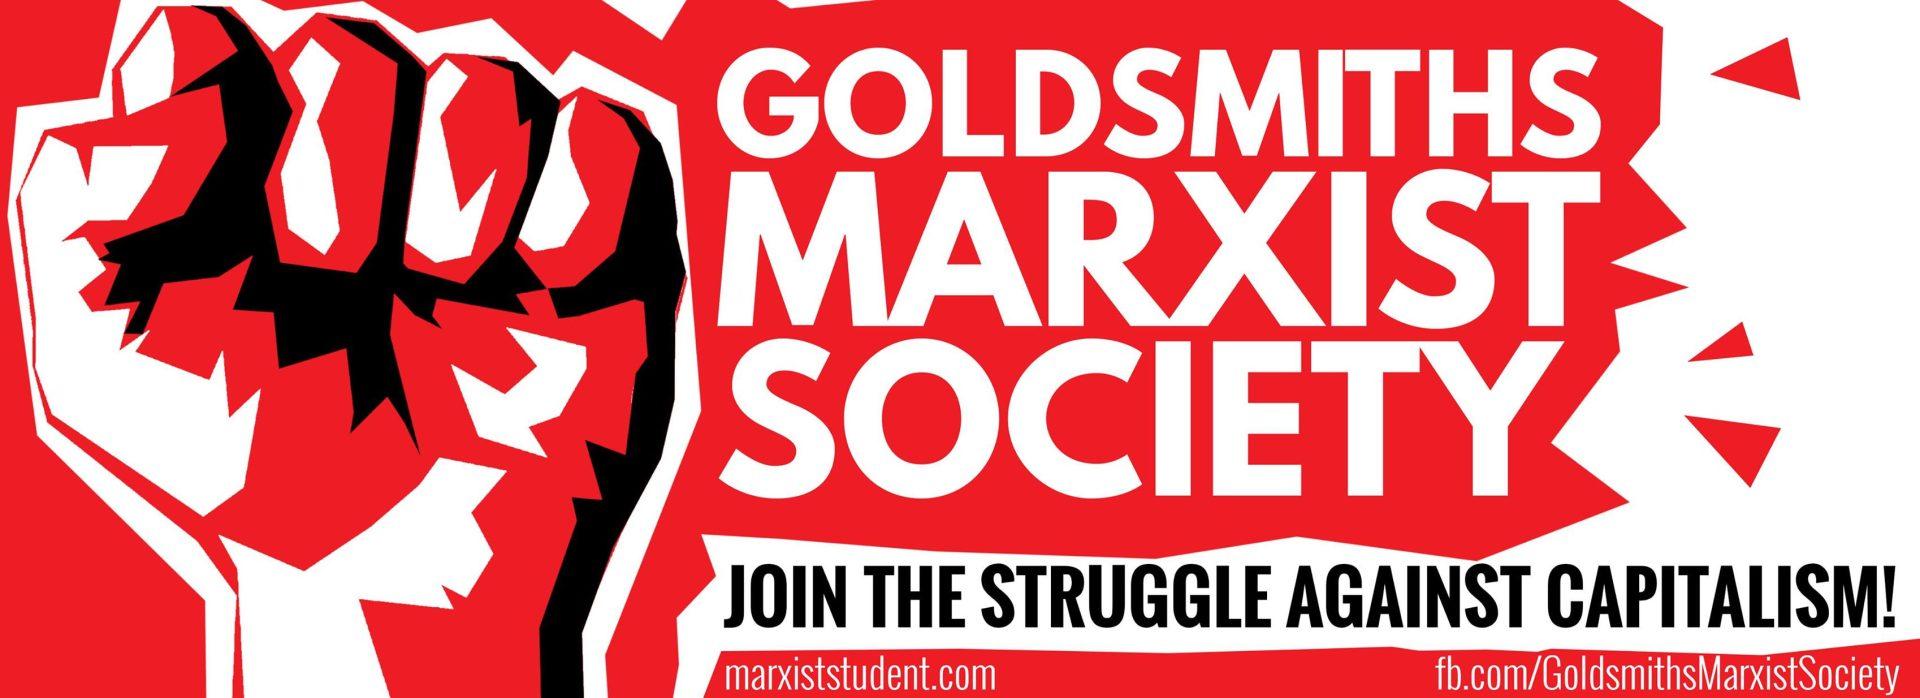 Goldsmiths Marxists